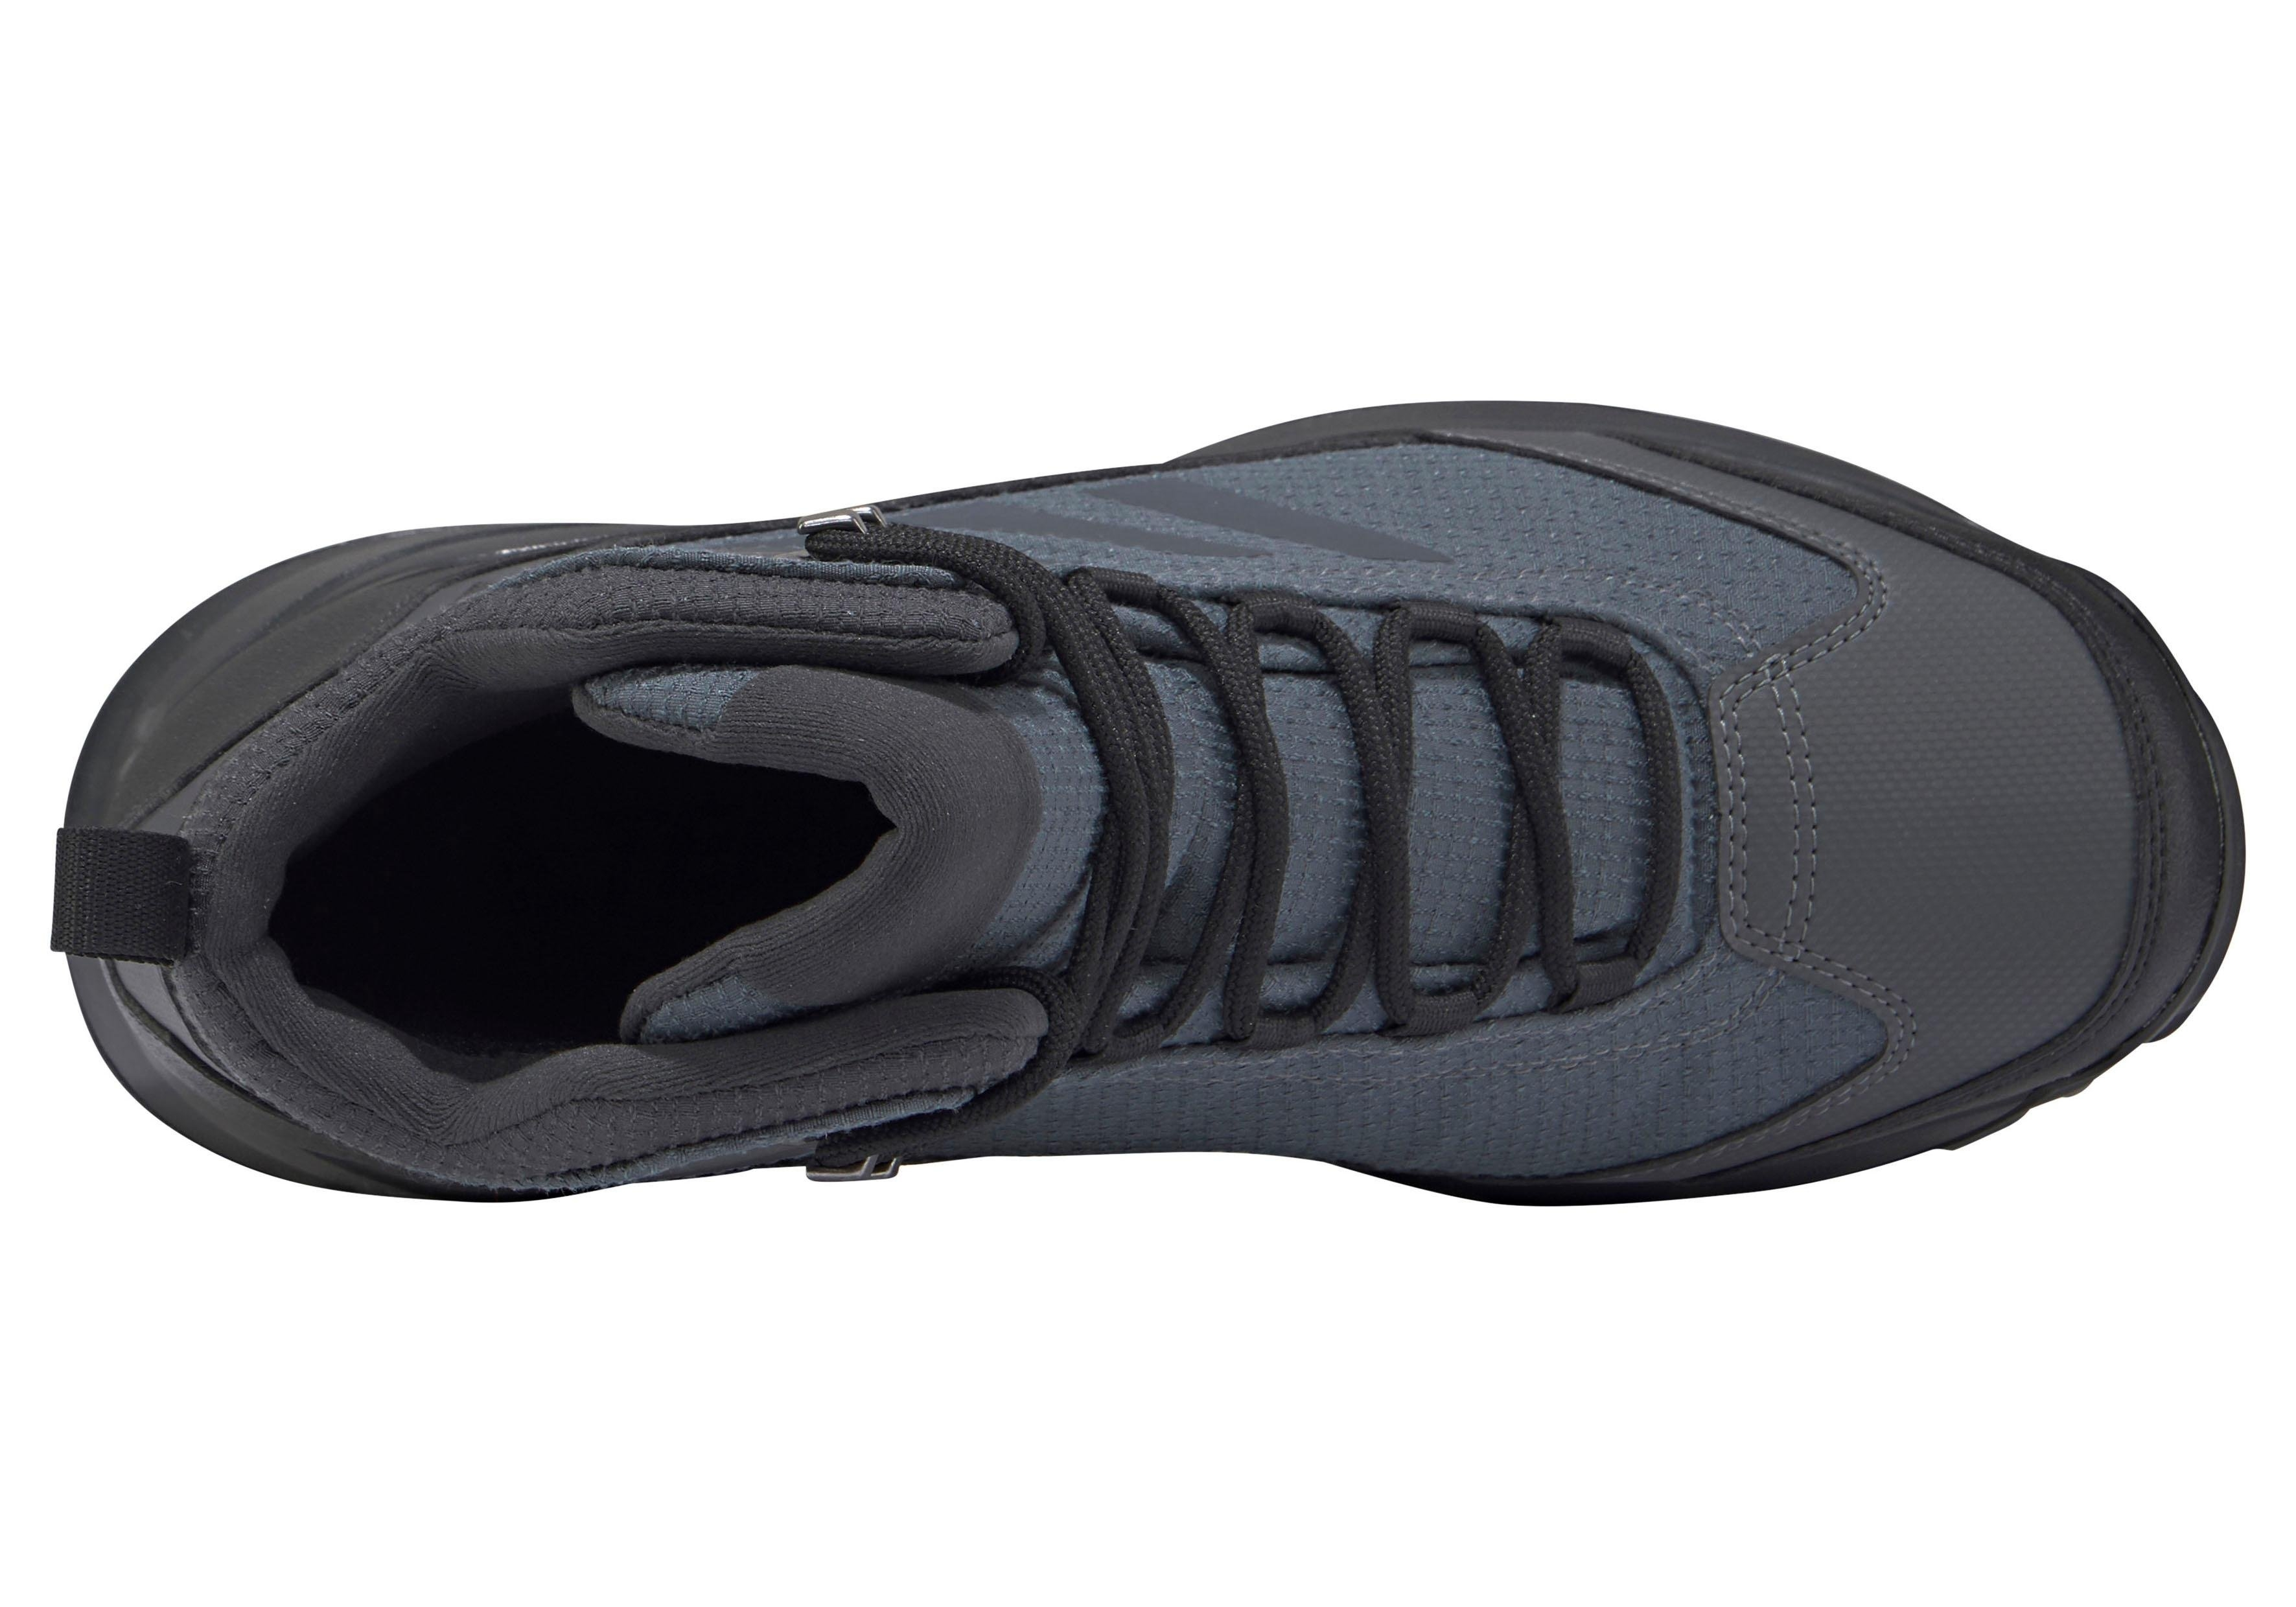 Adidas Performance Online Gekocht Snel Heron Mid Winterlaarzenterrex Climaproof hrdCsQt